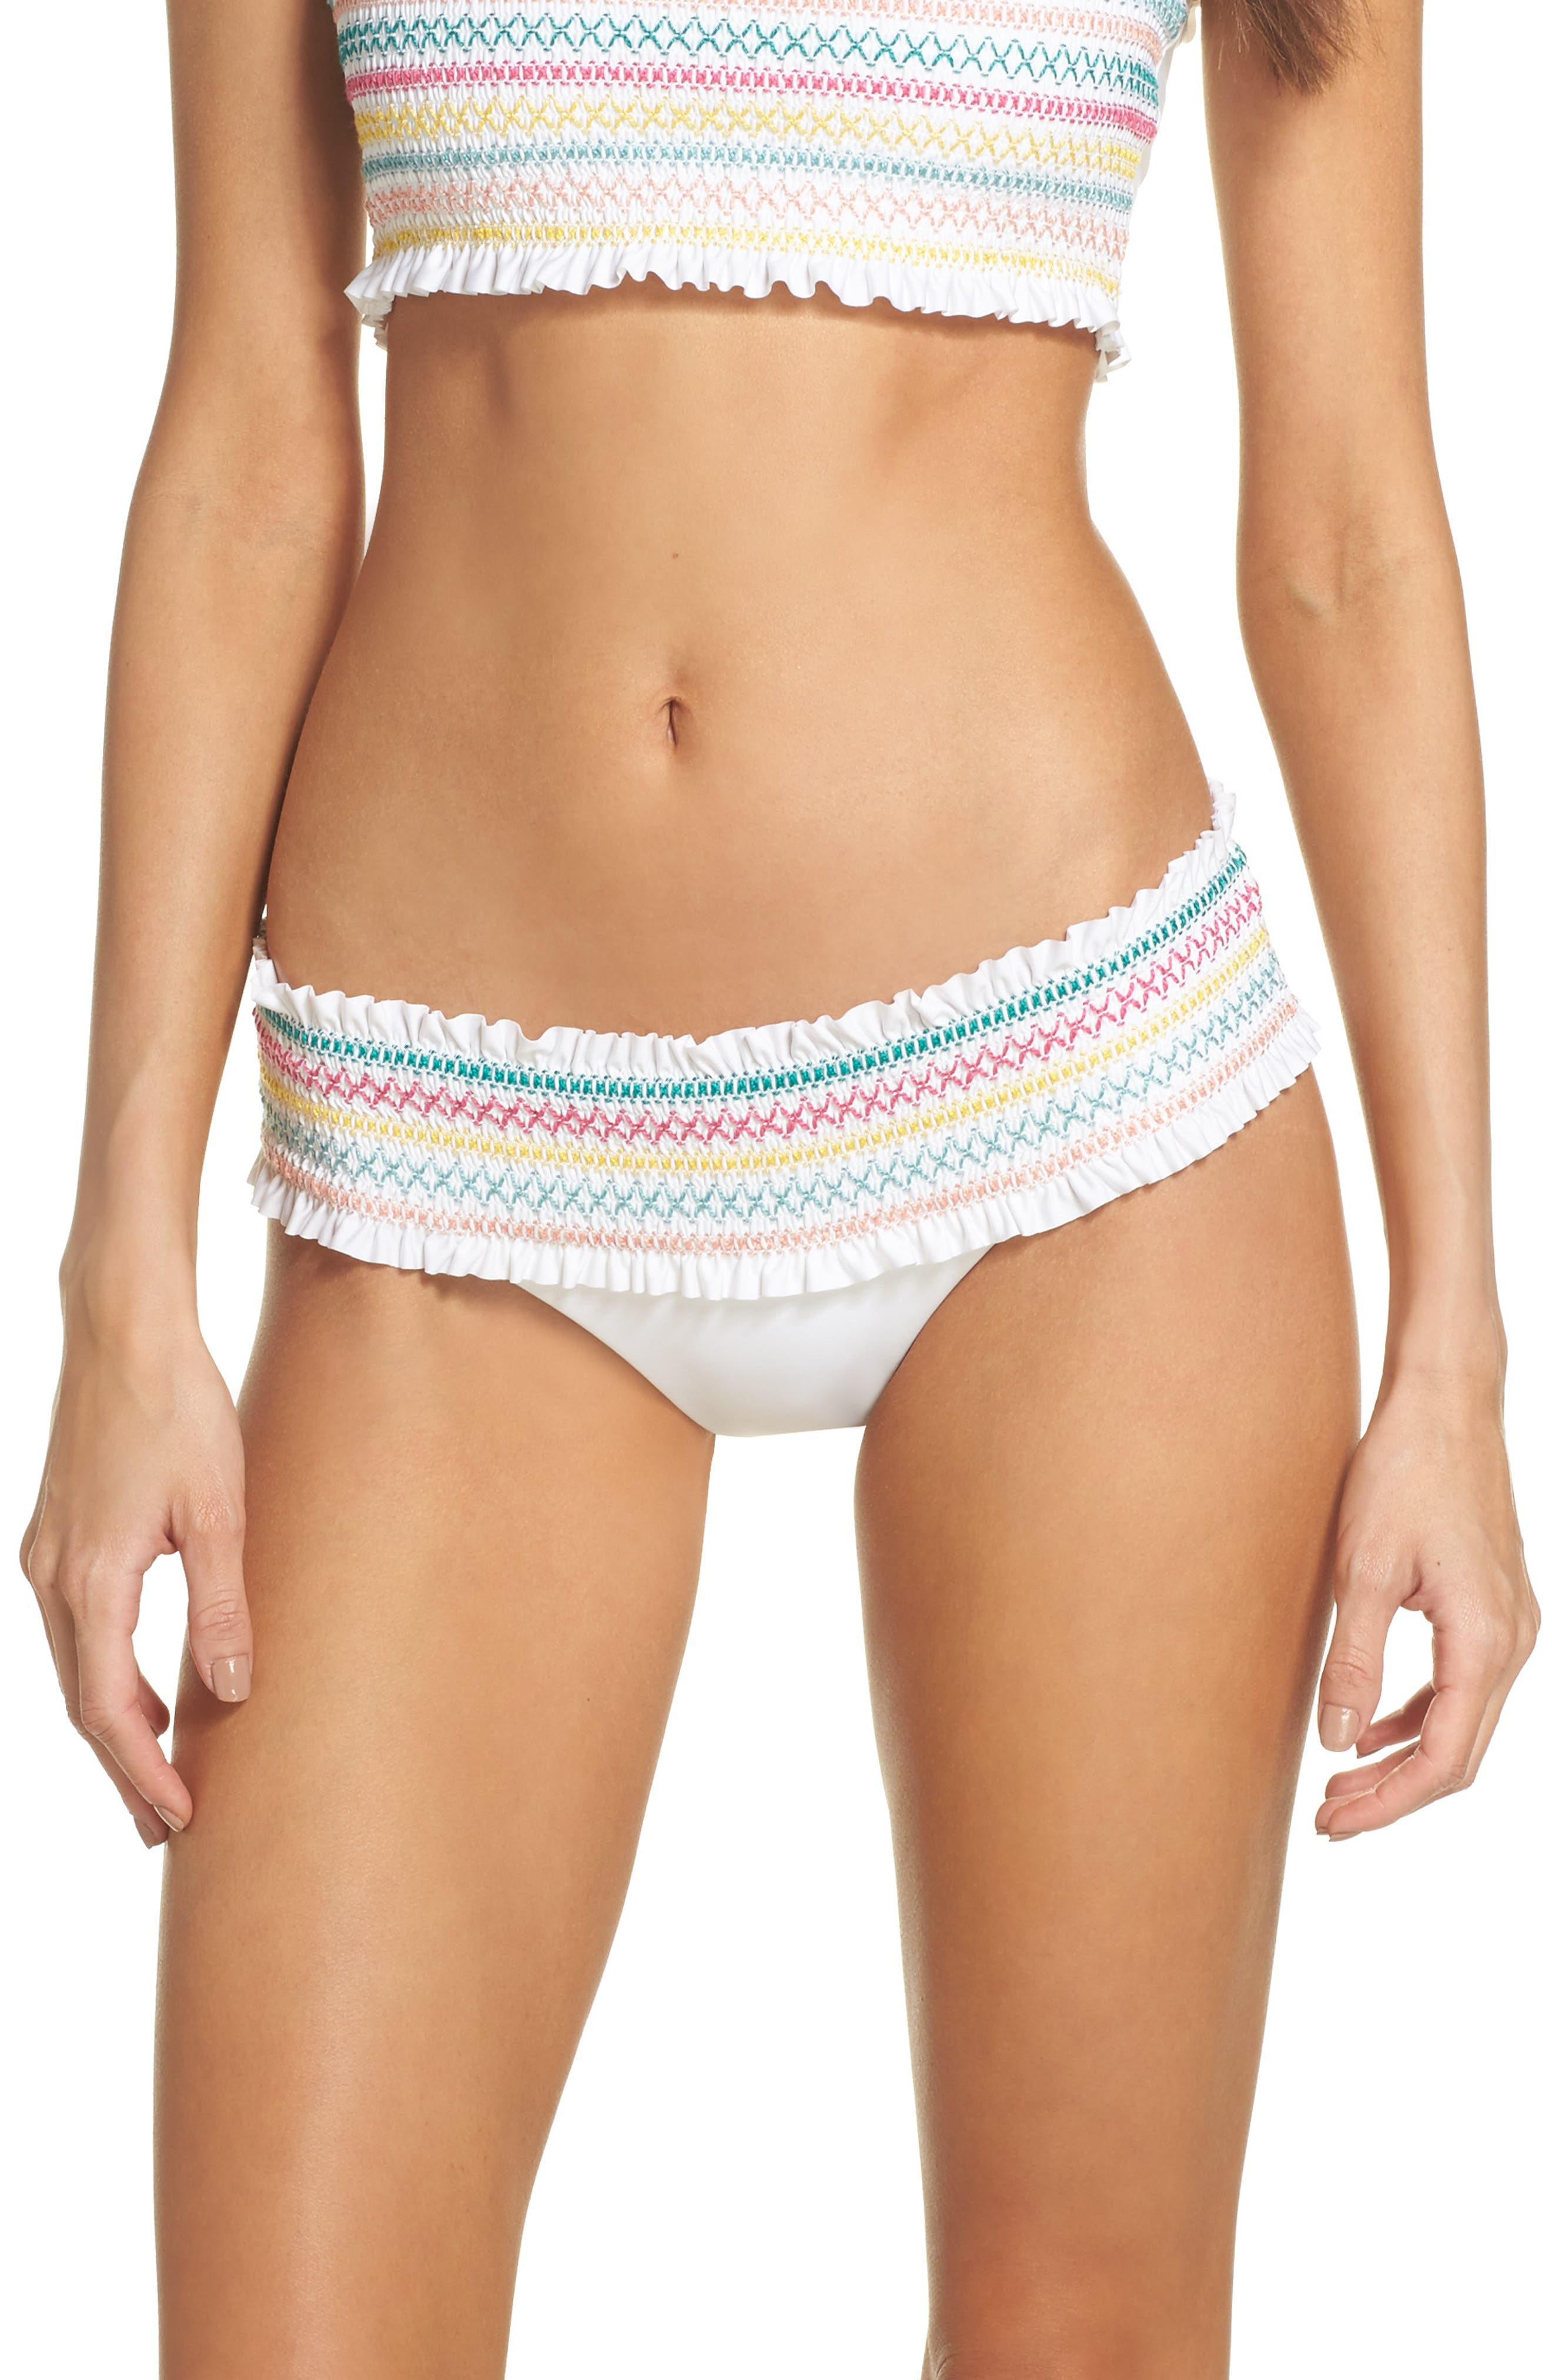 Crystal Cove Smocked Bikini Bottoms,                         Main,                         color, White